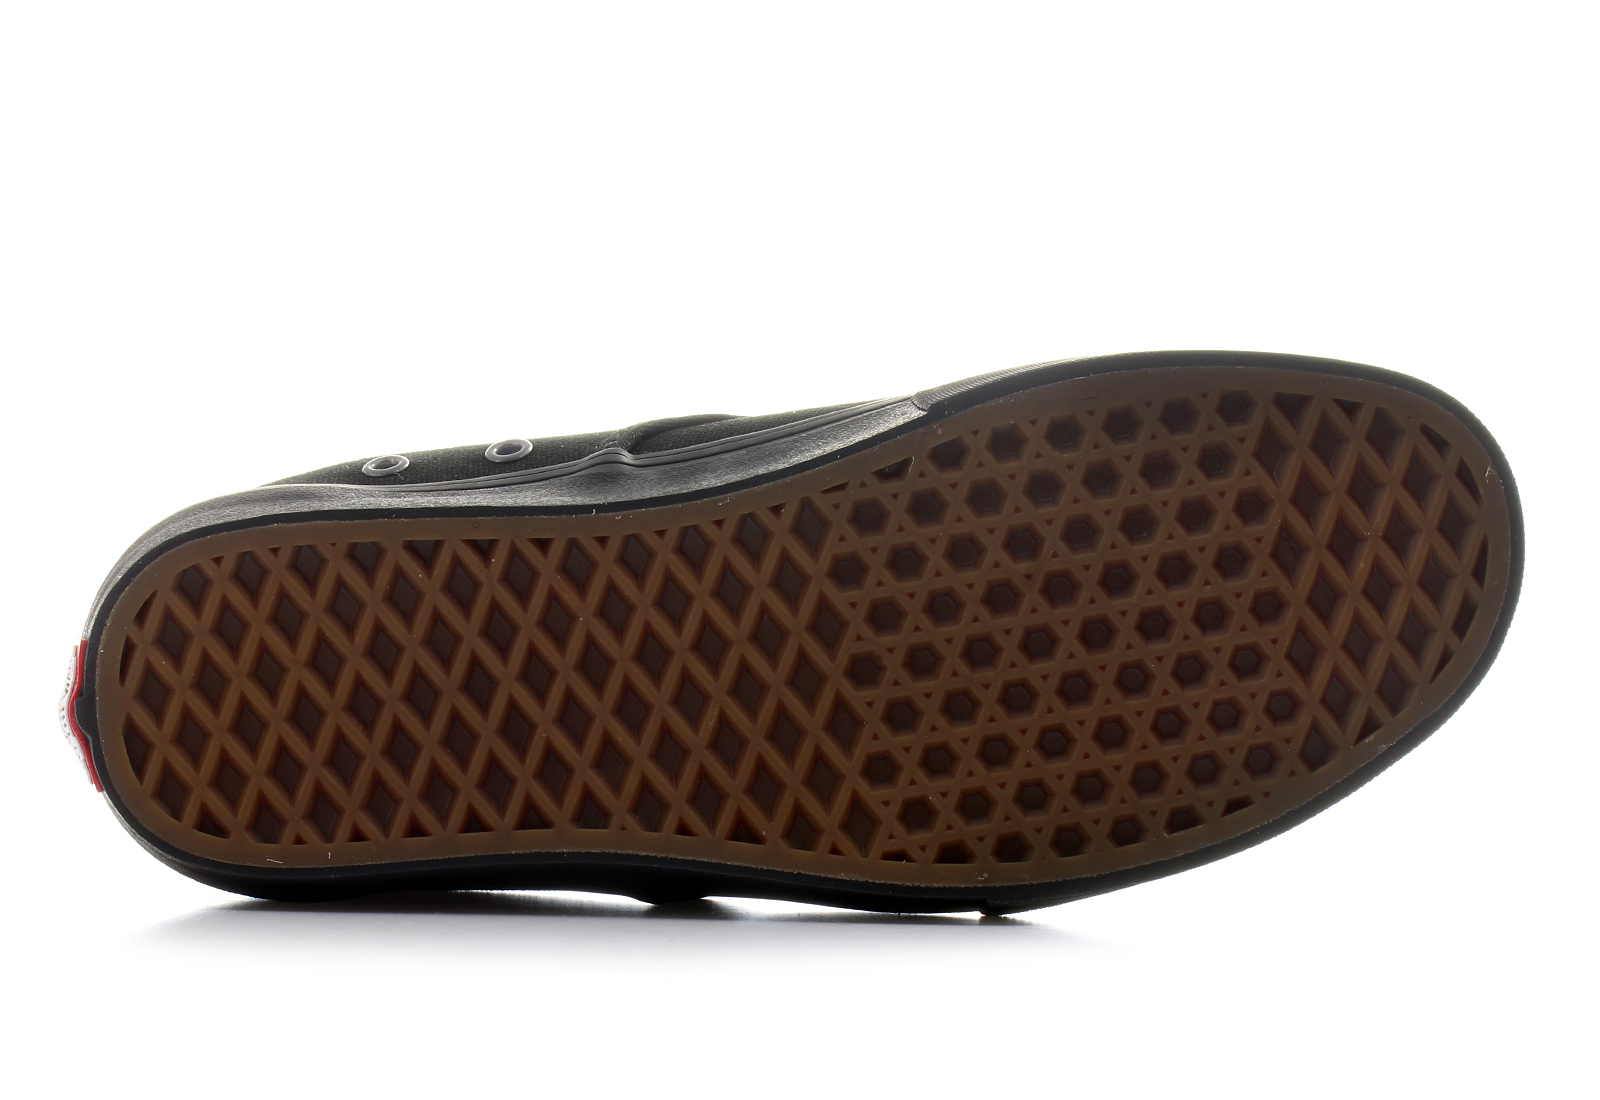 c71c7563d8358c Vans Sneakers - Chima Ferguson Pro - VA38CF8Q9 - Online shop for ...